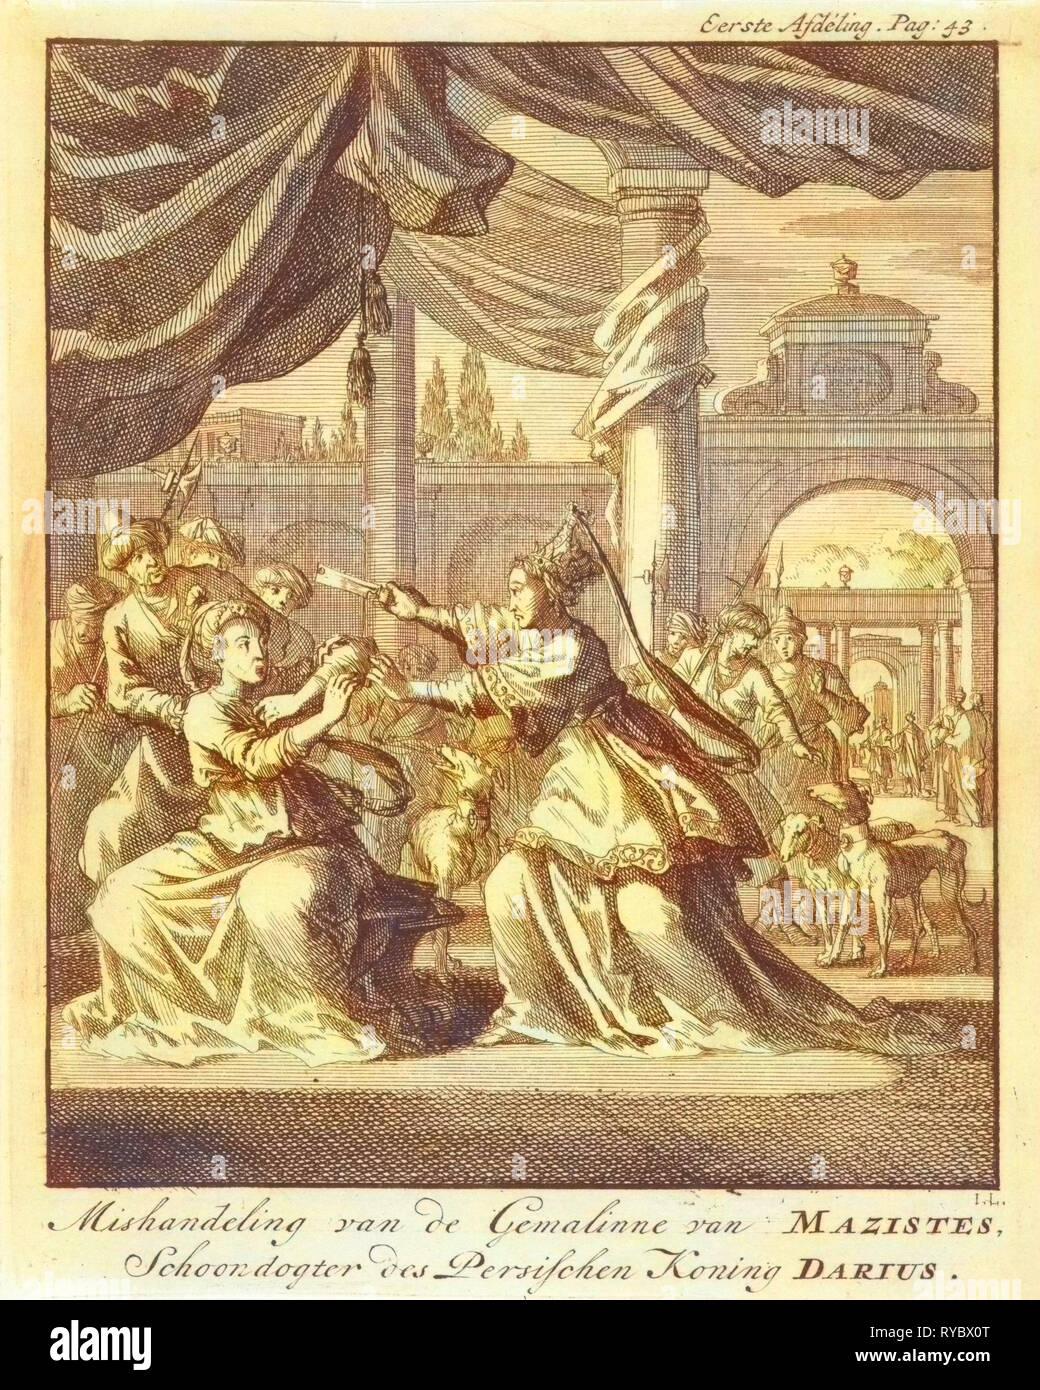 Mistreatment of women of Masistes, Jan Luyken, Jan Claesz ten Hoorn, 1699 - Stock Image